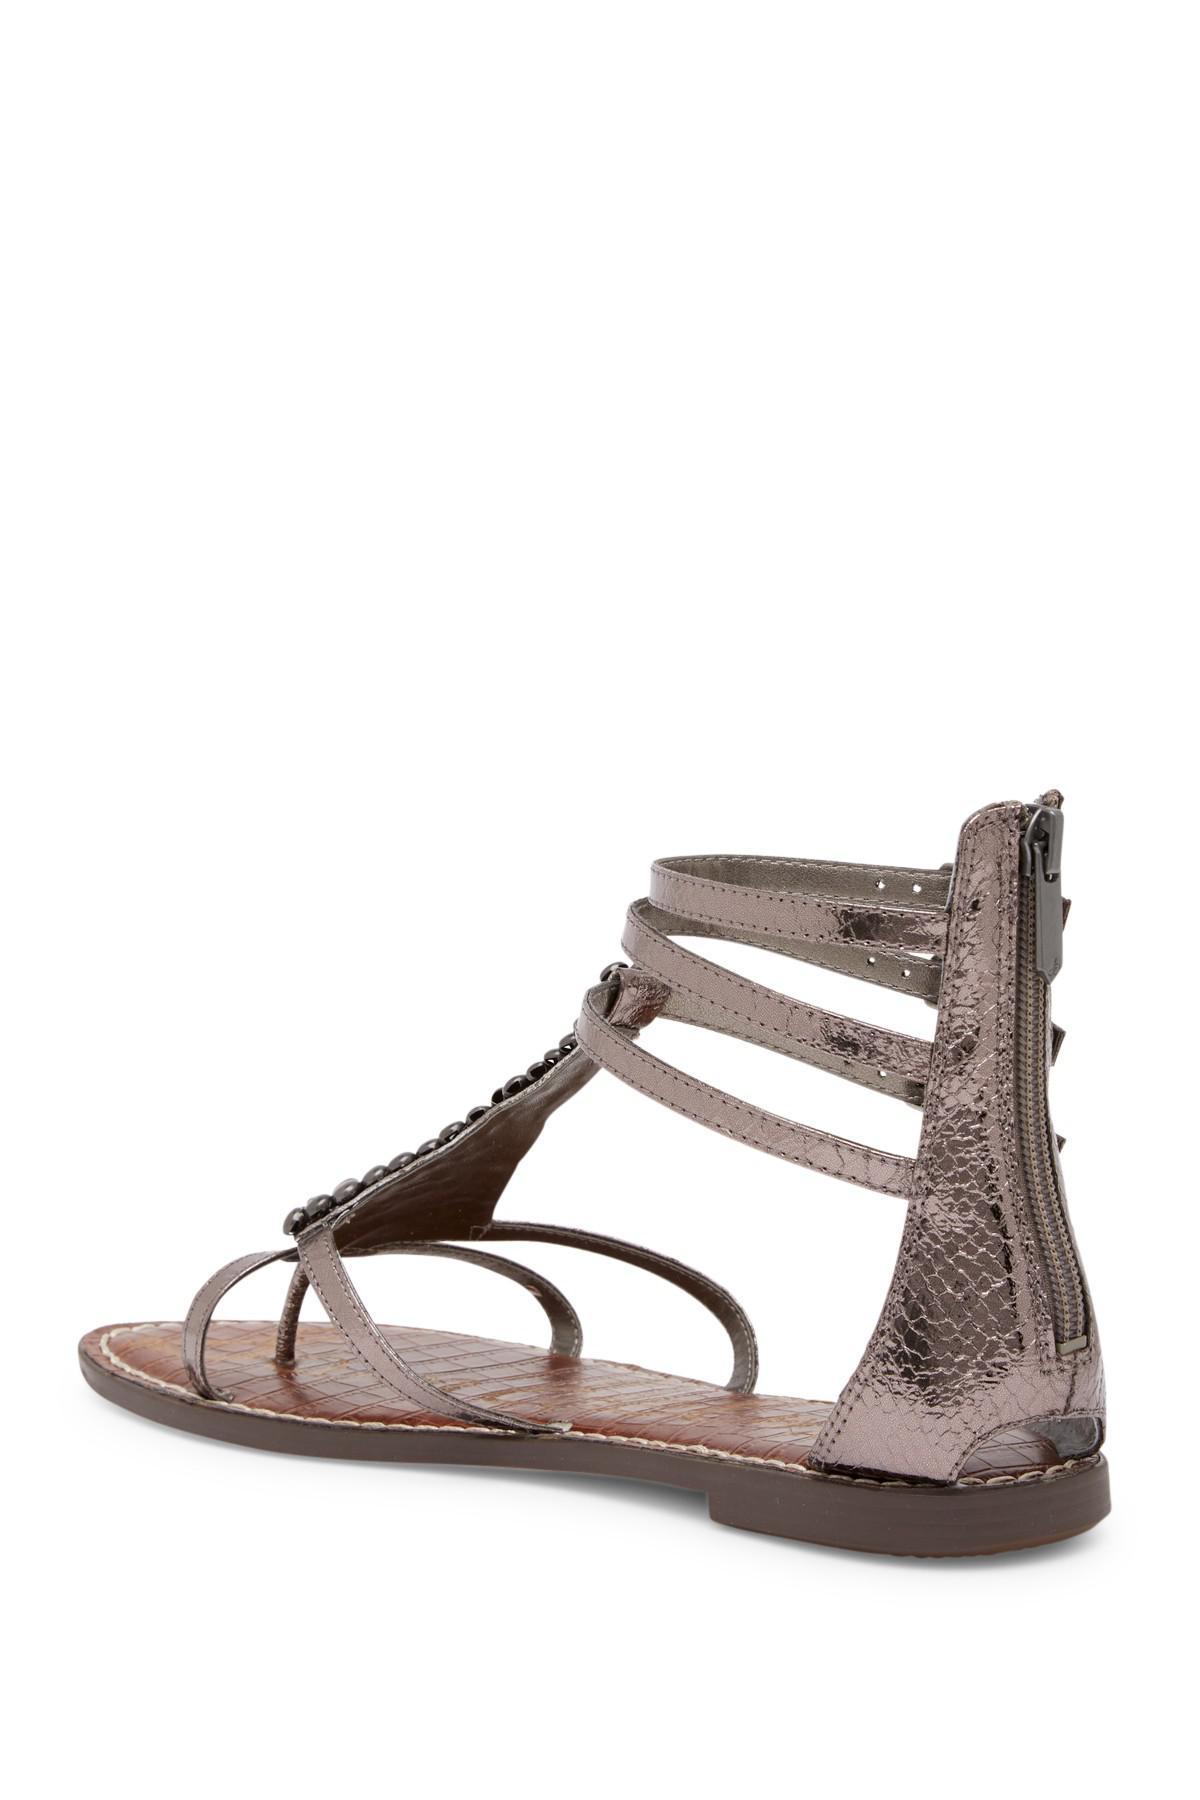 a98a948970fc1 Lyst - Sam Edelman Ginger Beaded Gladiator Sandal